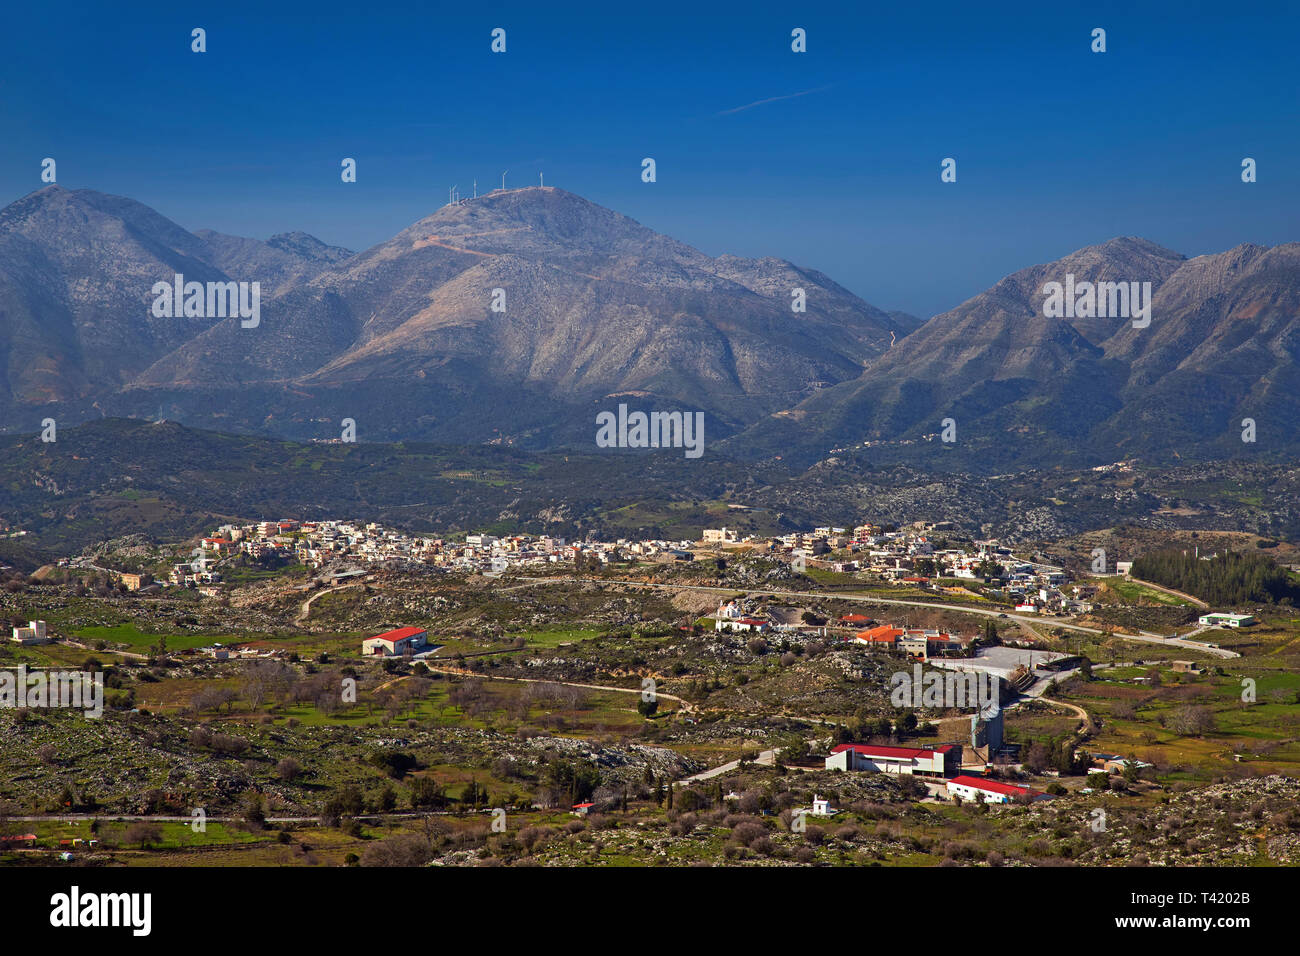 Panoramic view of Anogeia village, Psiloritis mountain, Rethimno, Crete, Greece. - Stock Image